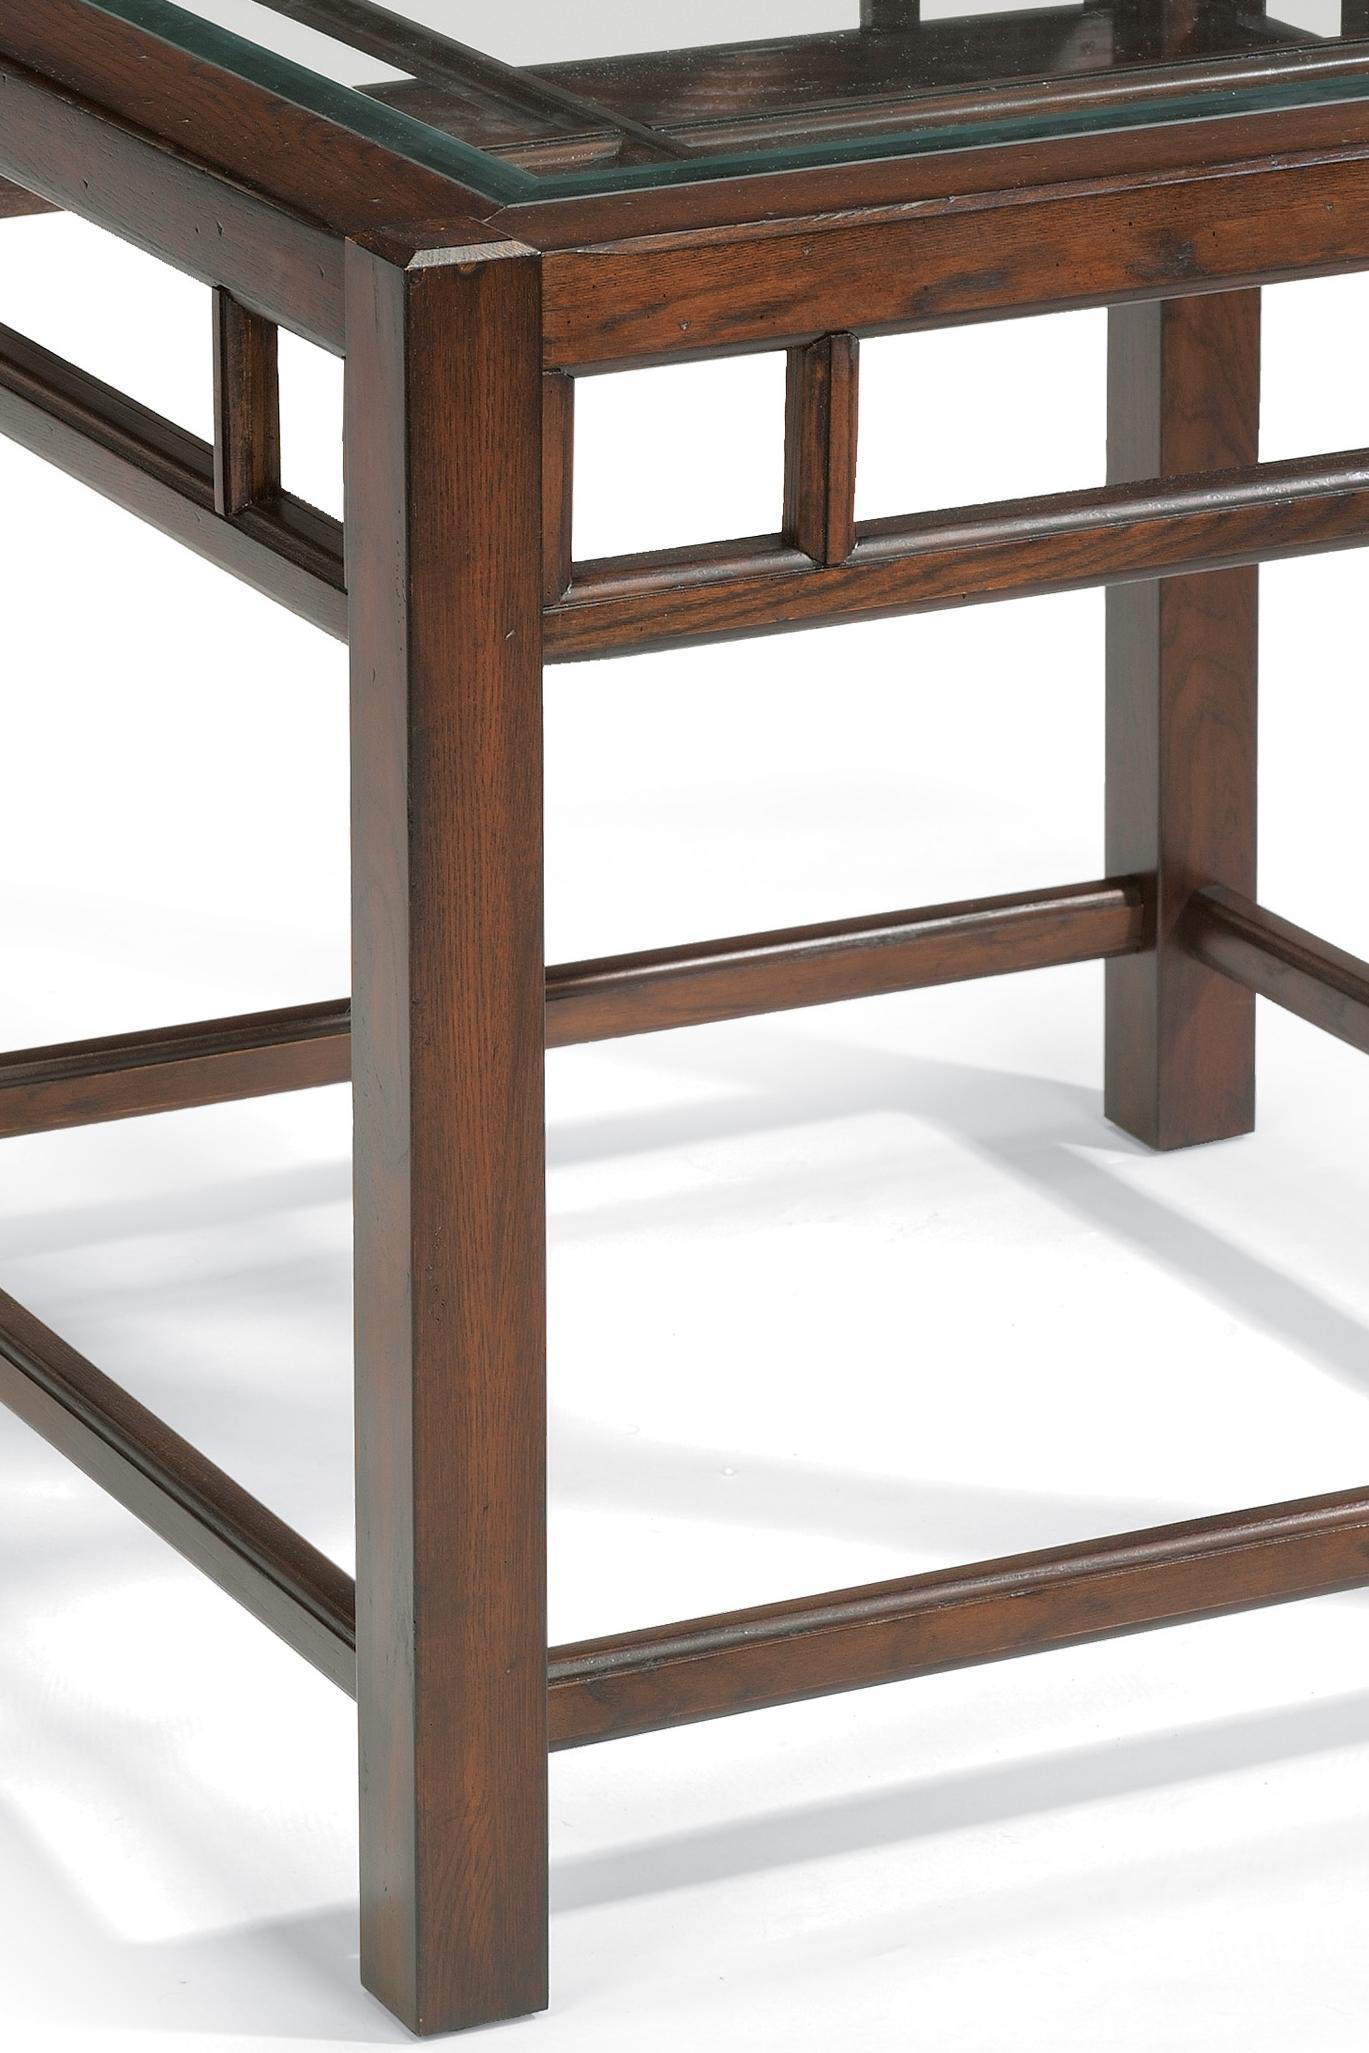 Sonoma 6625 By Flexsteel Belfort Furniture Flexsteel Sonoma Dealer